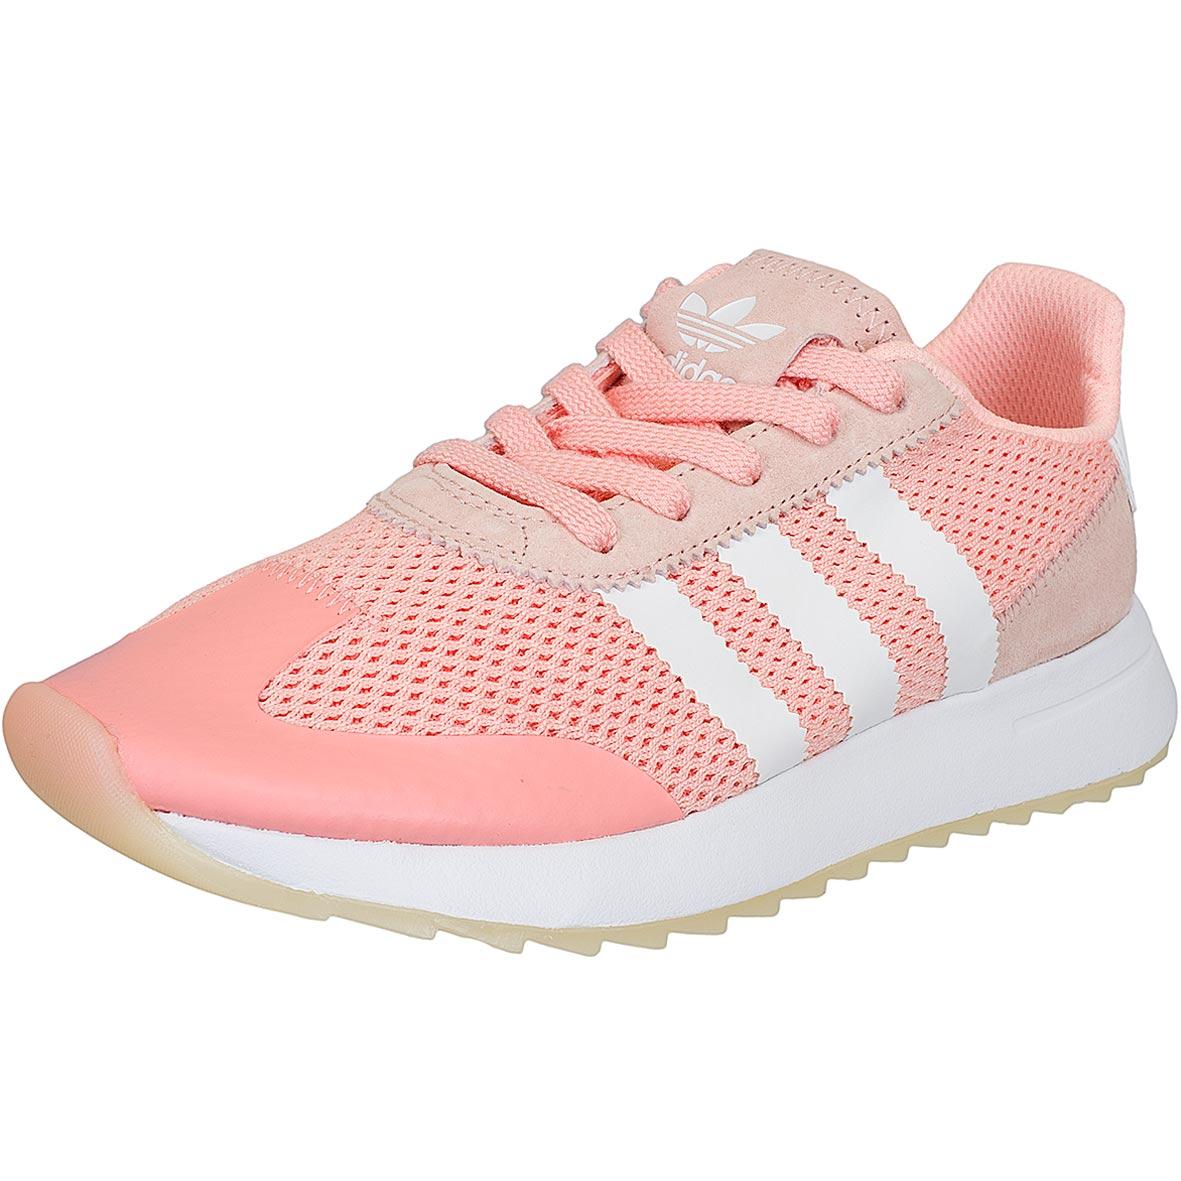 Adidas Originals Damen Sneaker Flashback pinkpink